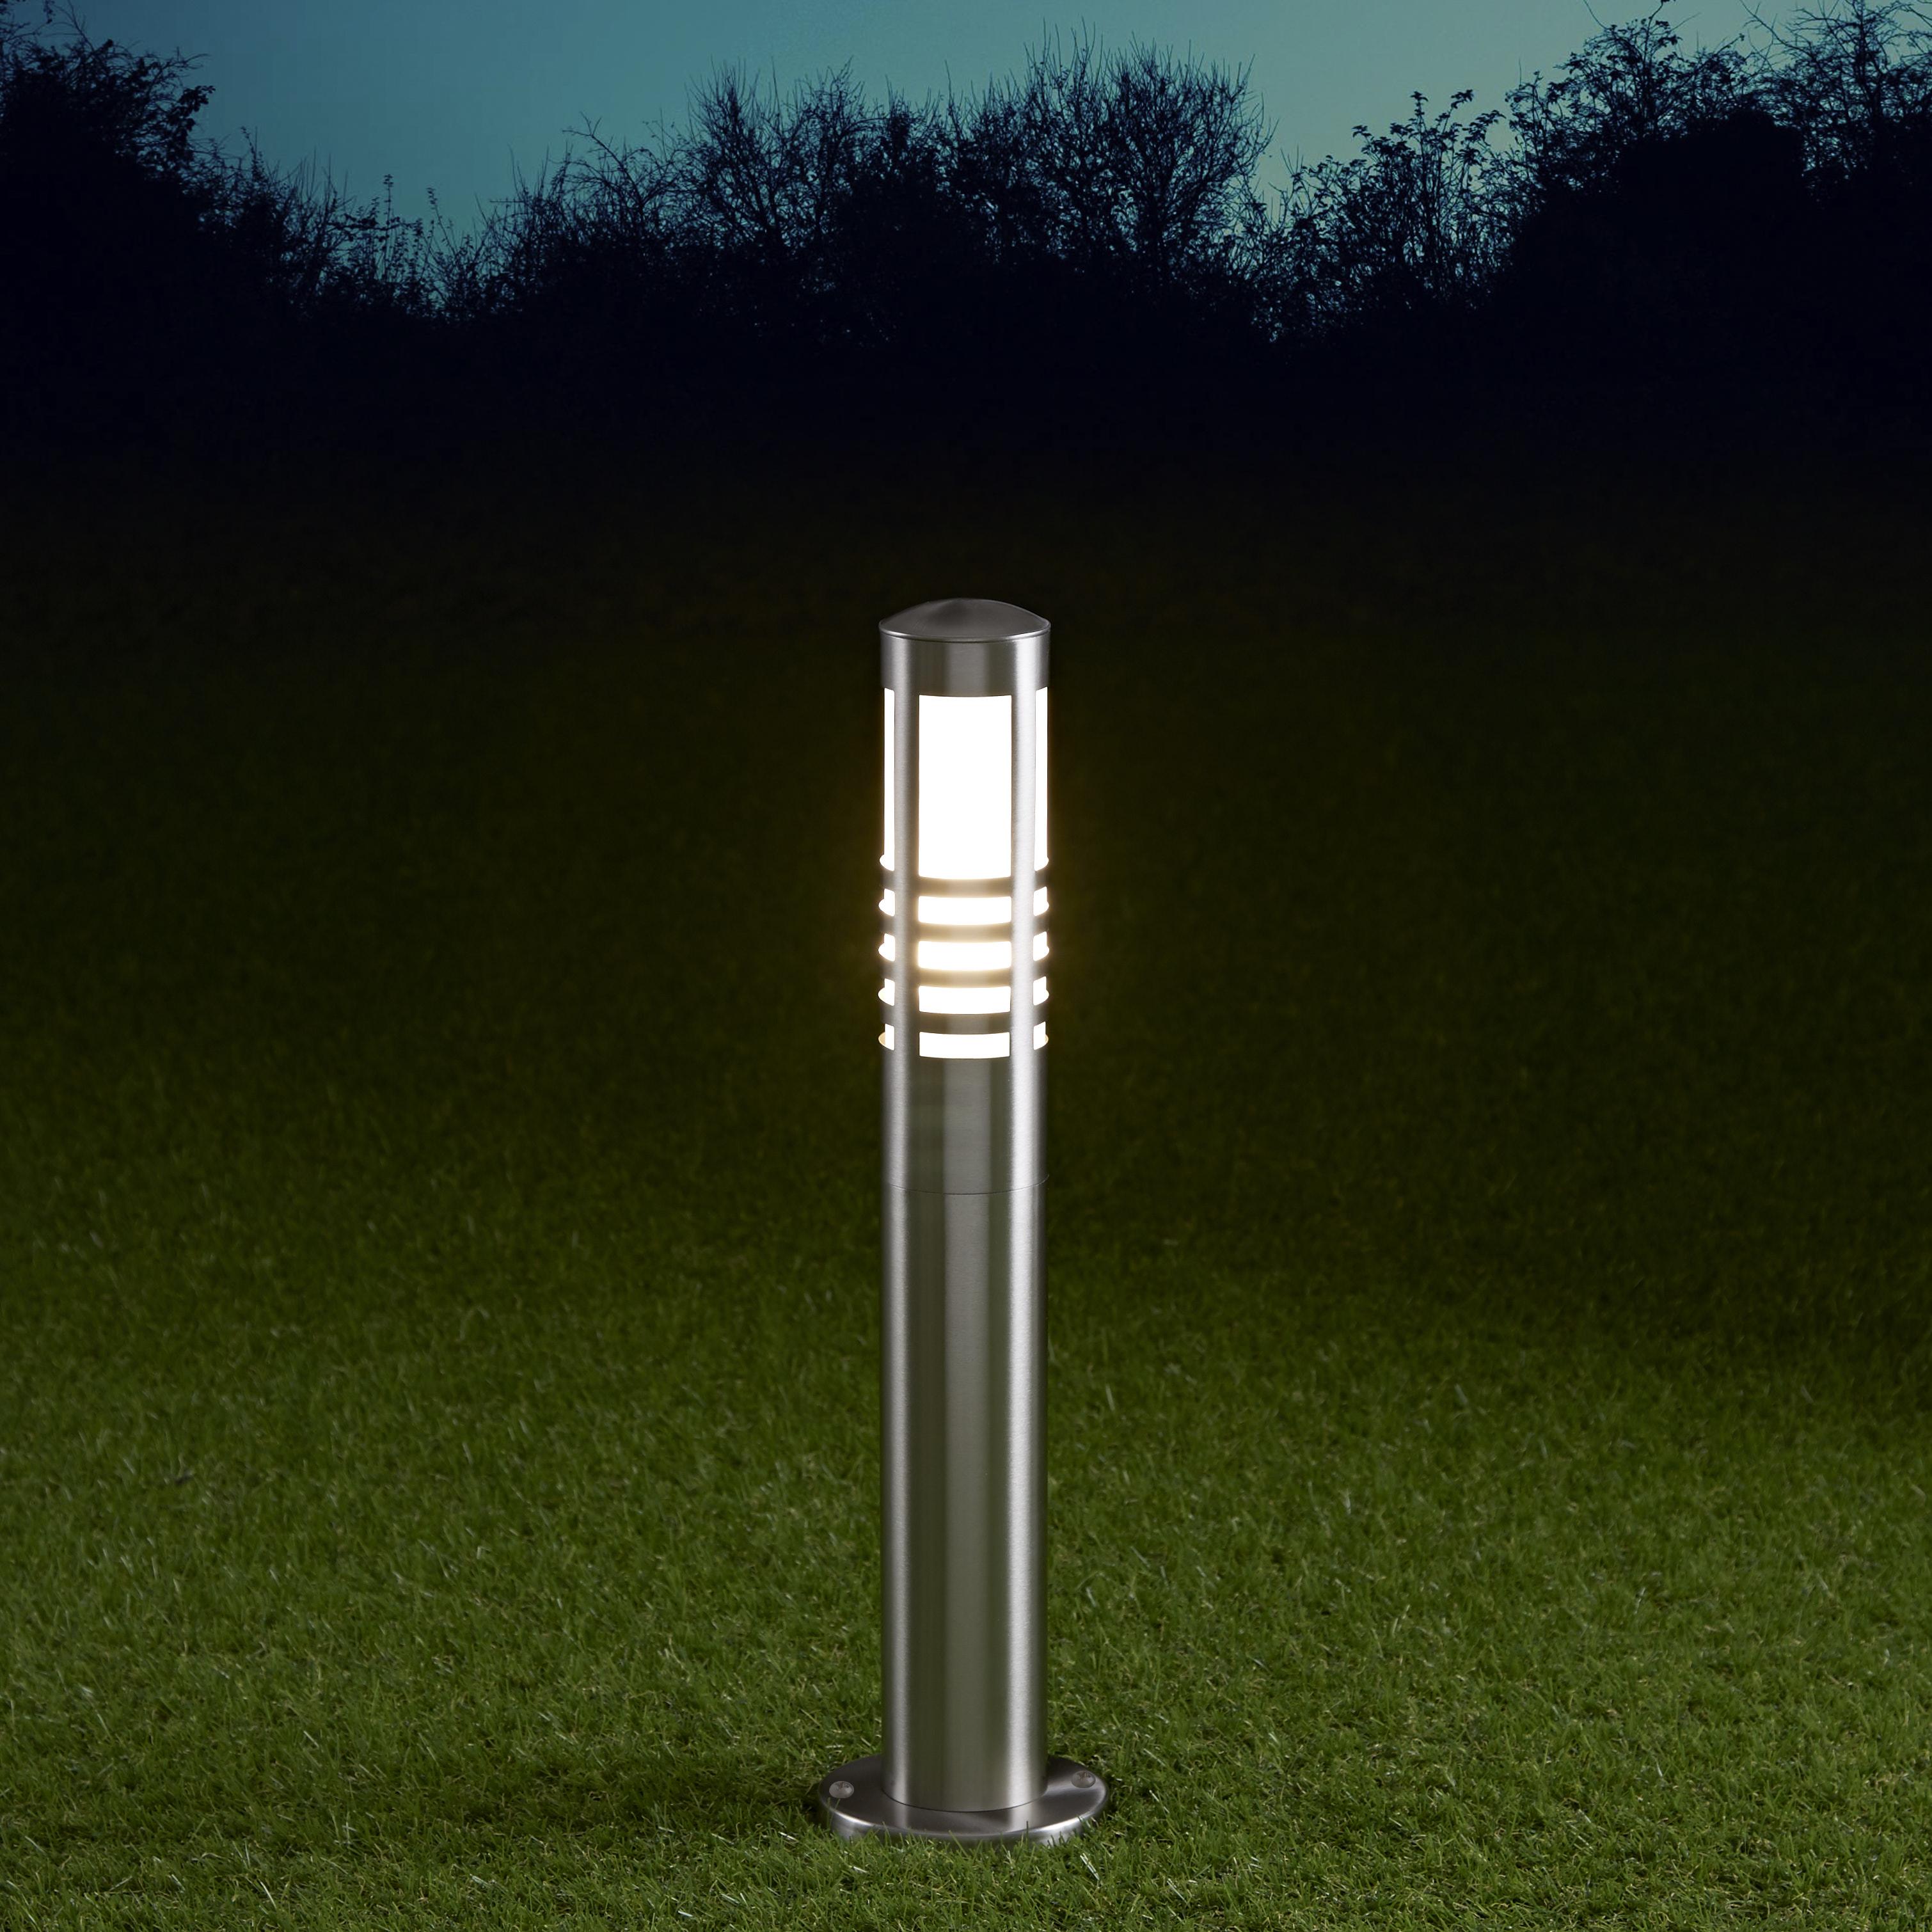 Sobremuro LED 450mm para Exteriores 6W de Acero Inoxidable - Orleans